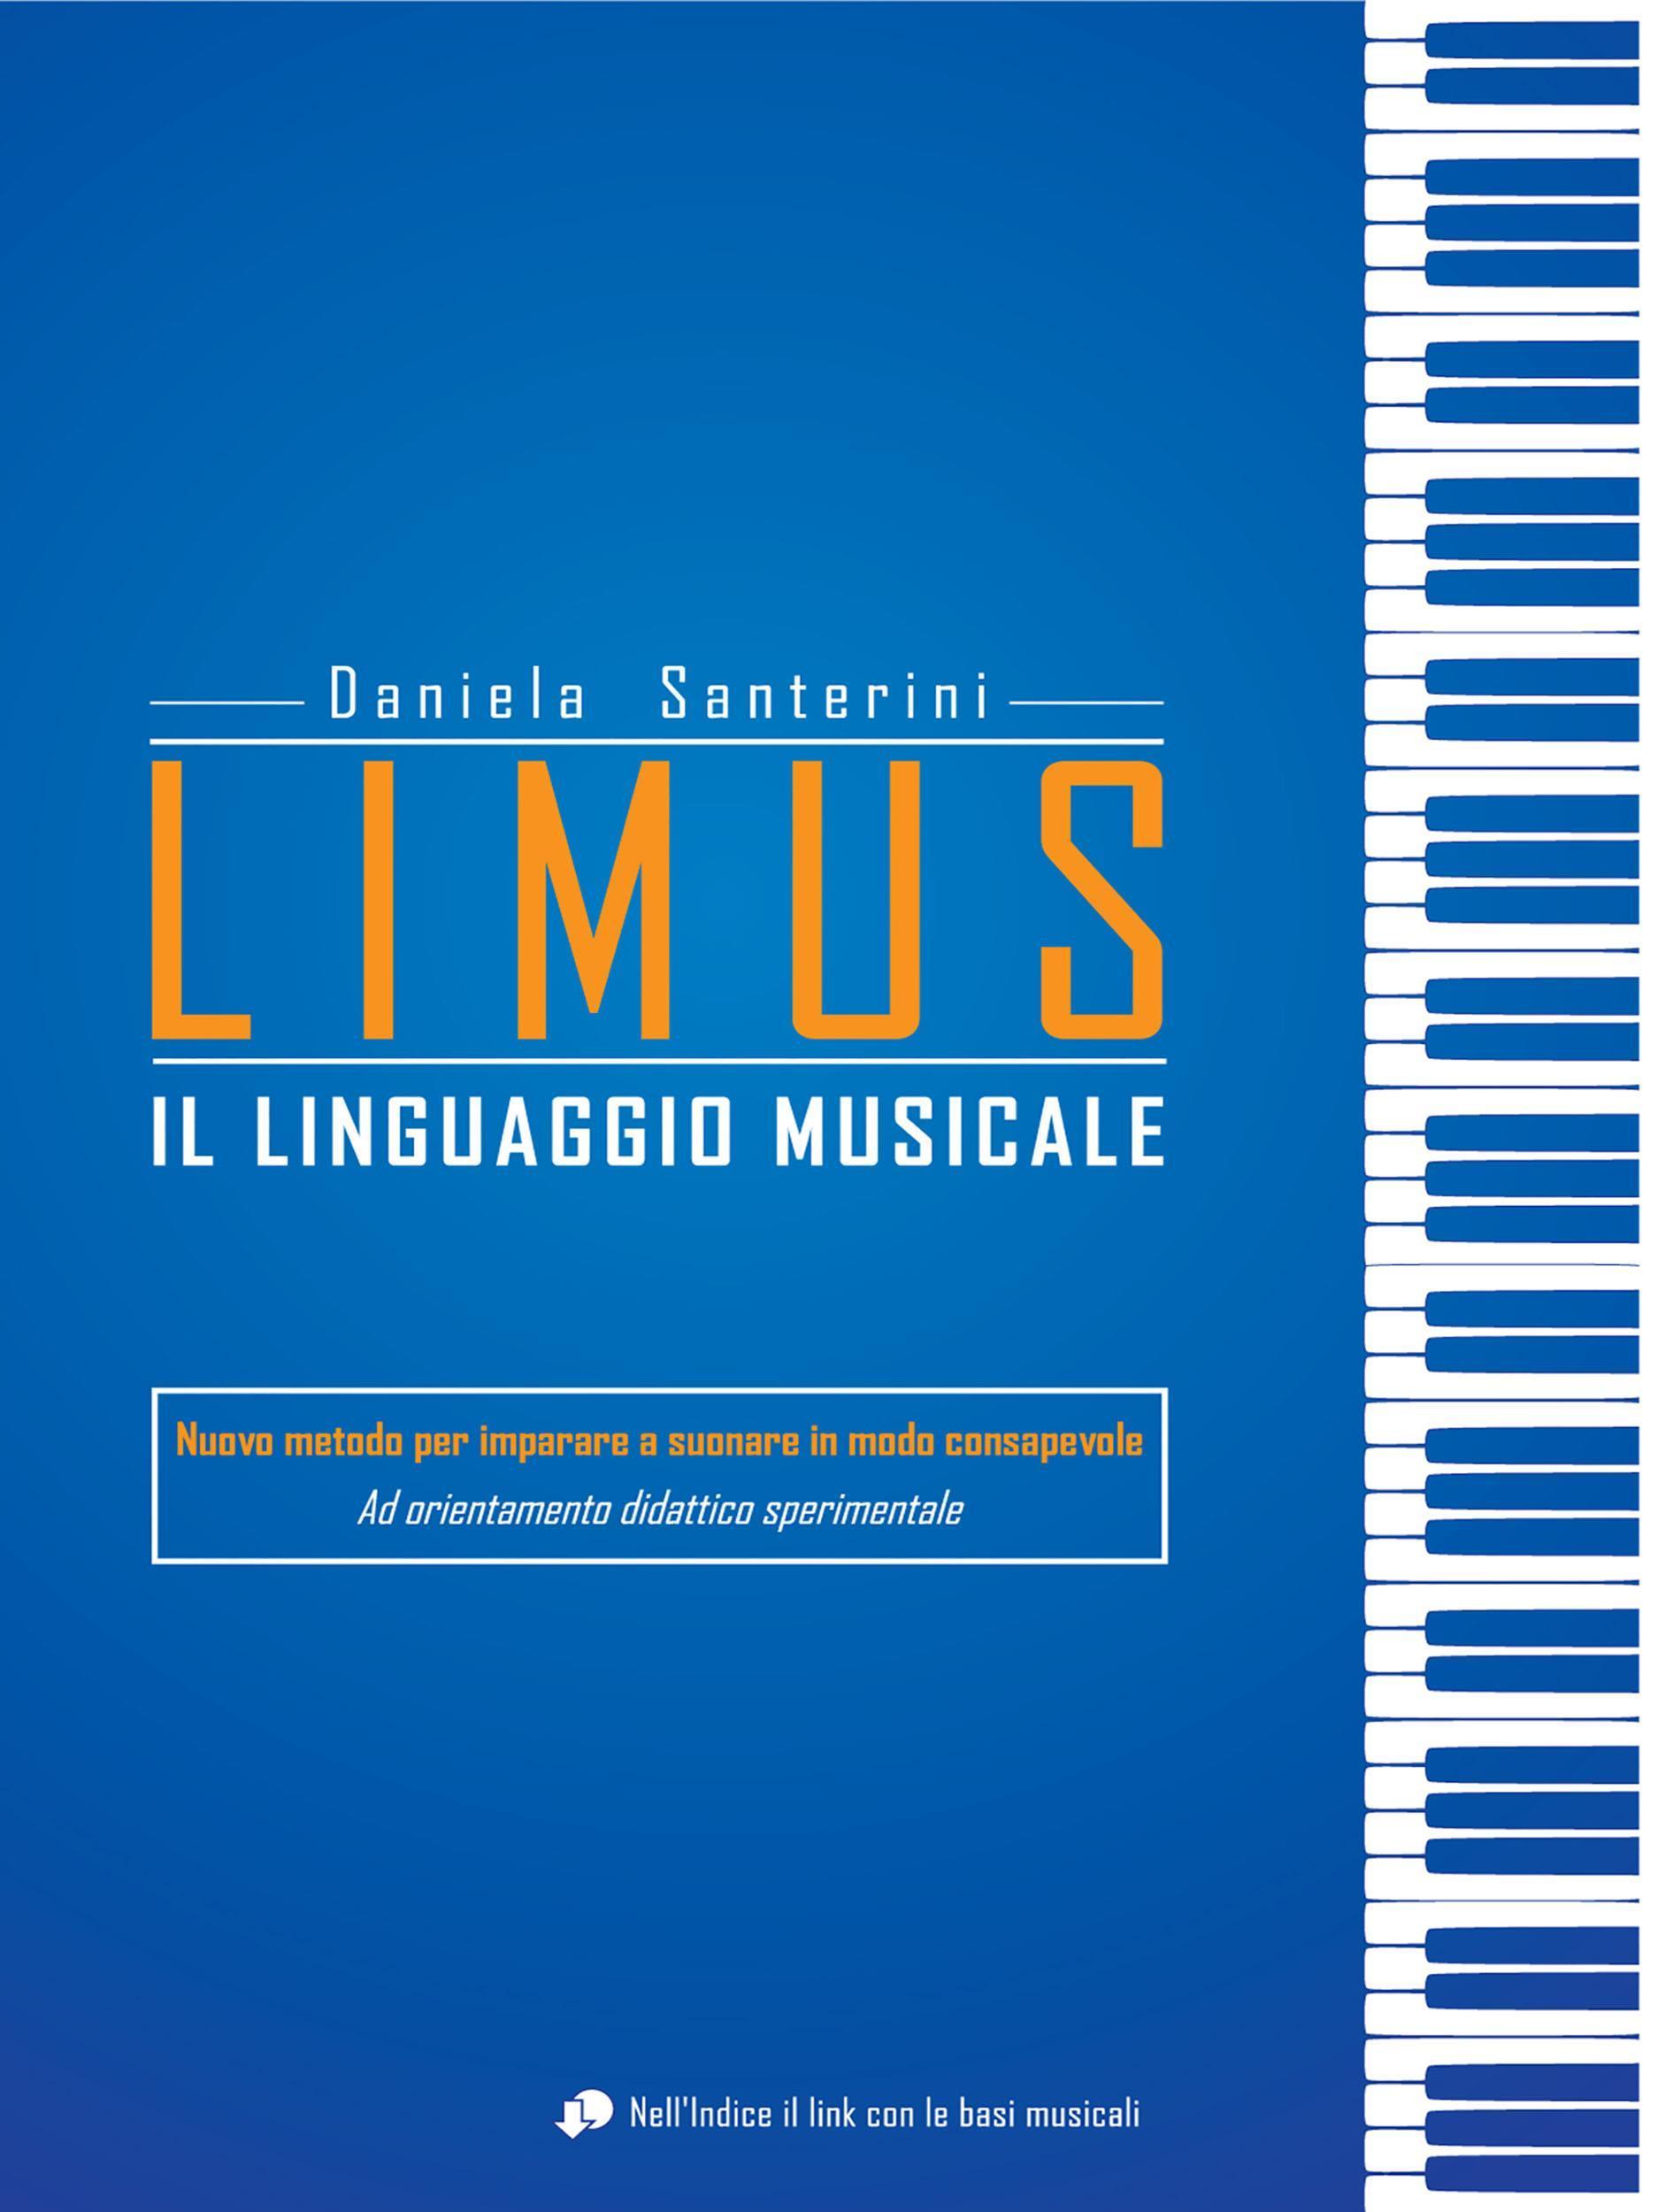 Limus - II Linguaggio Musicale